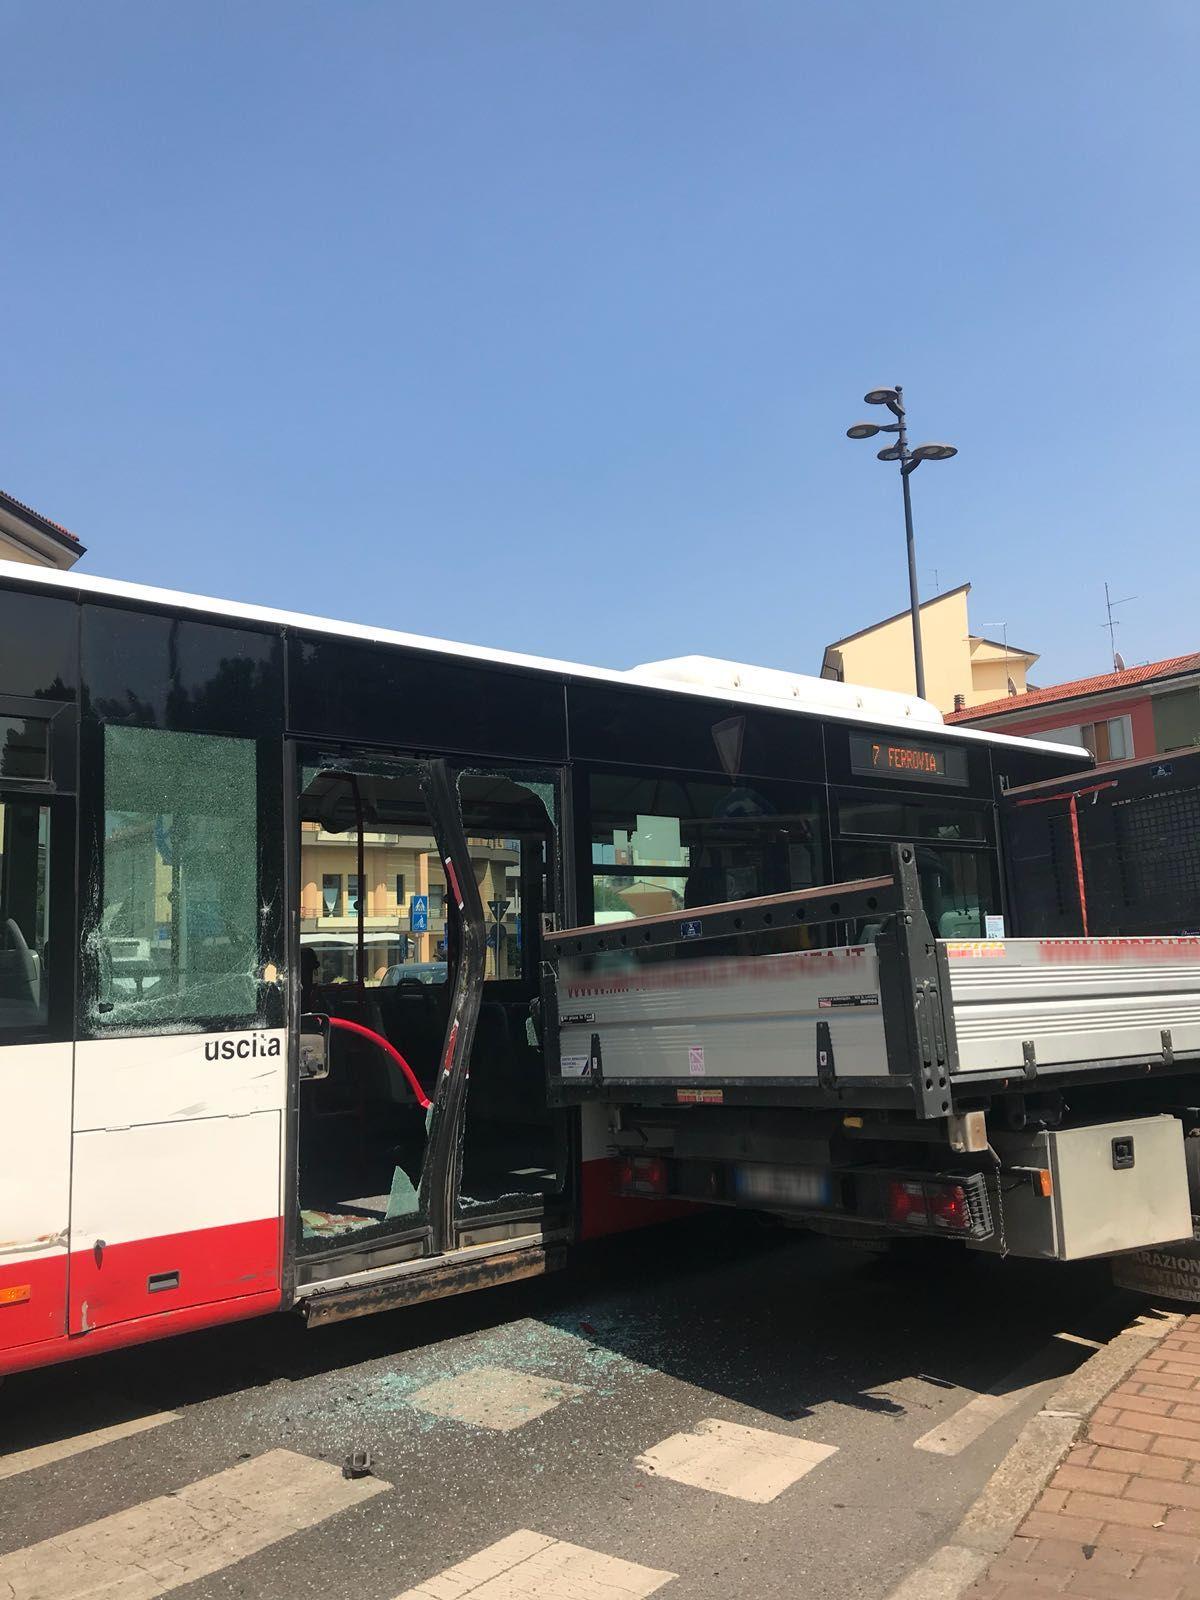 Furgone sfonda la porta del bus alla rotonda disagi al - Autobus prima porta ...